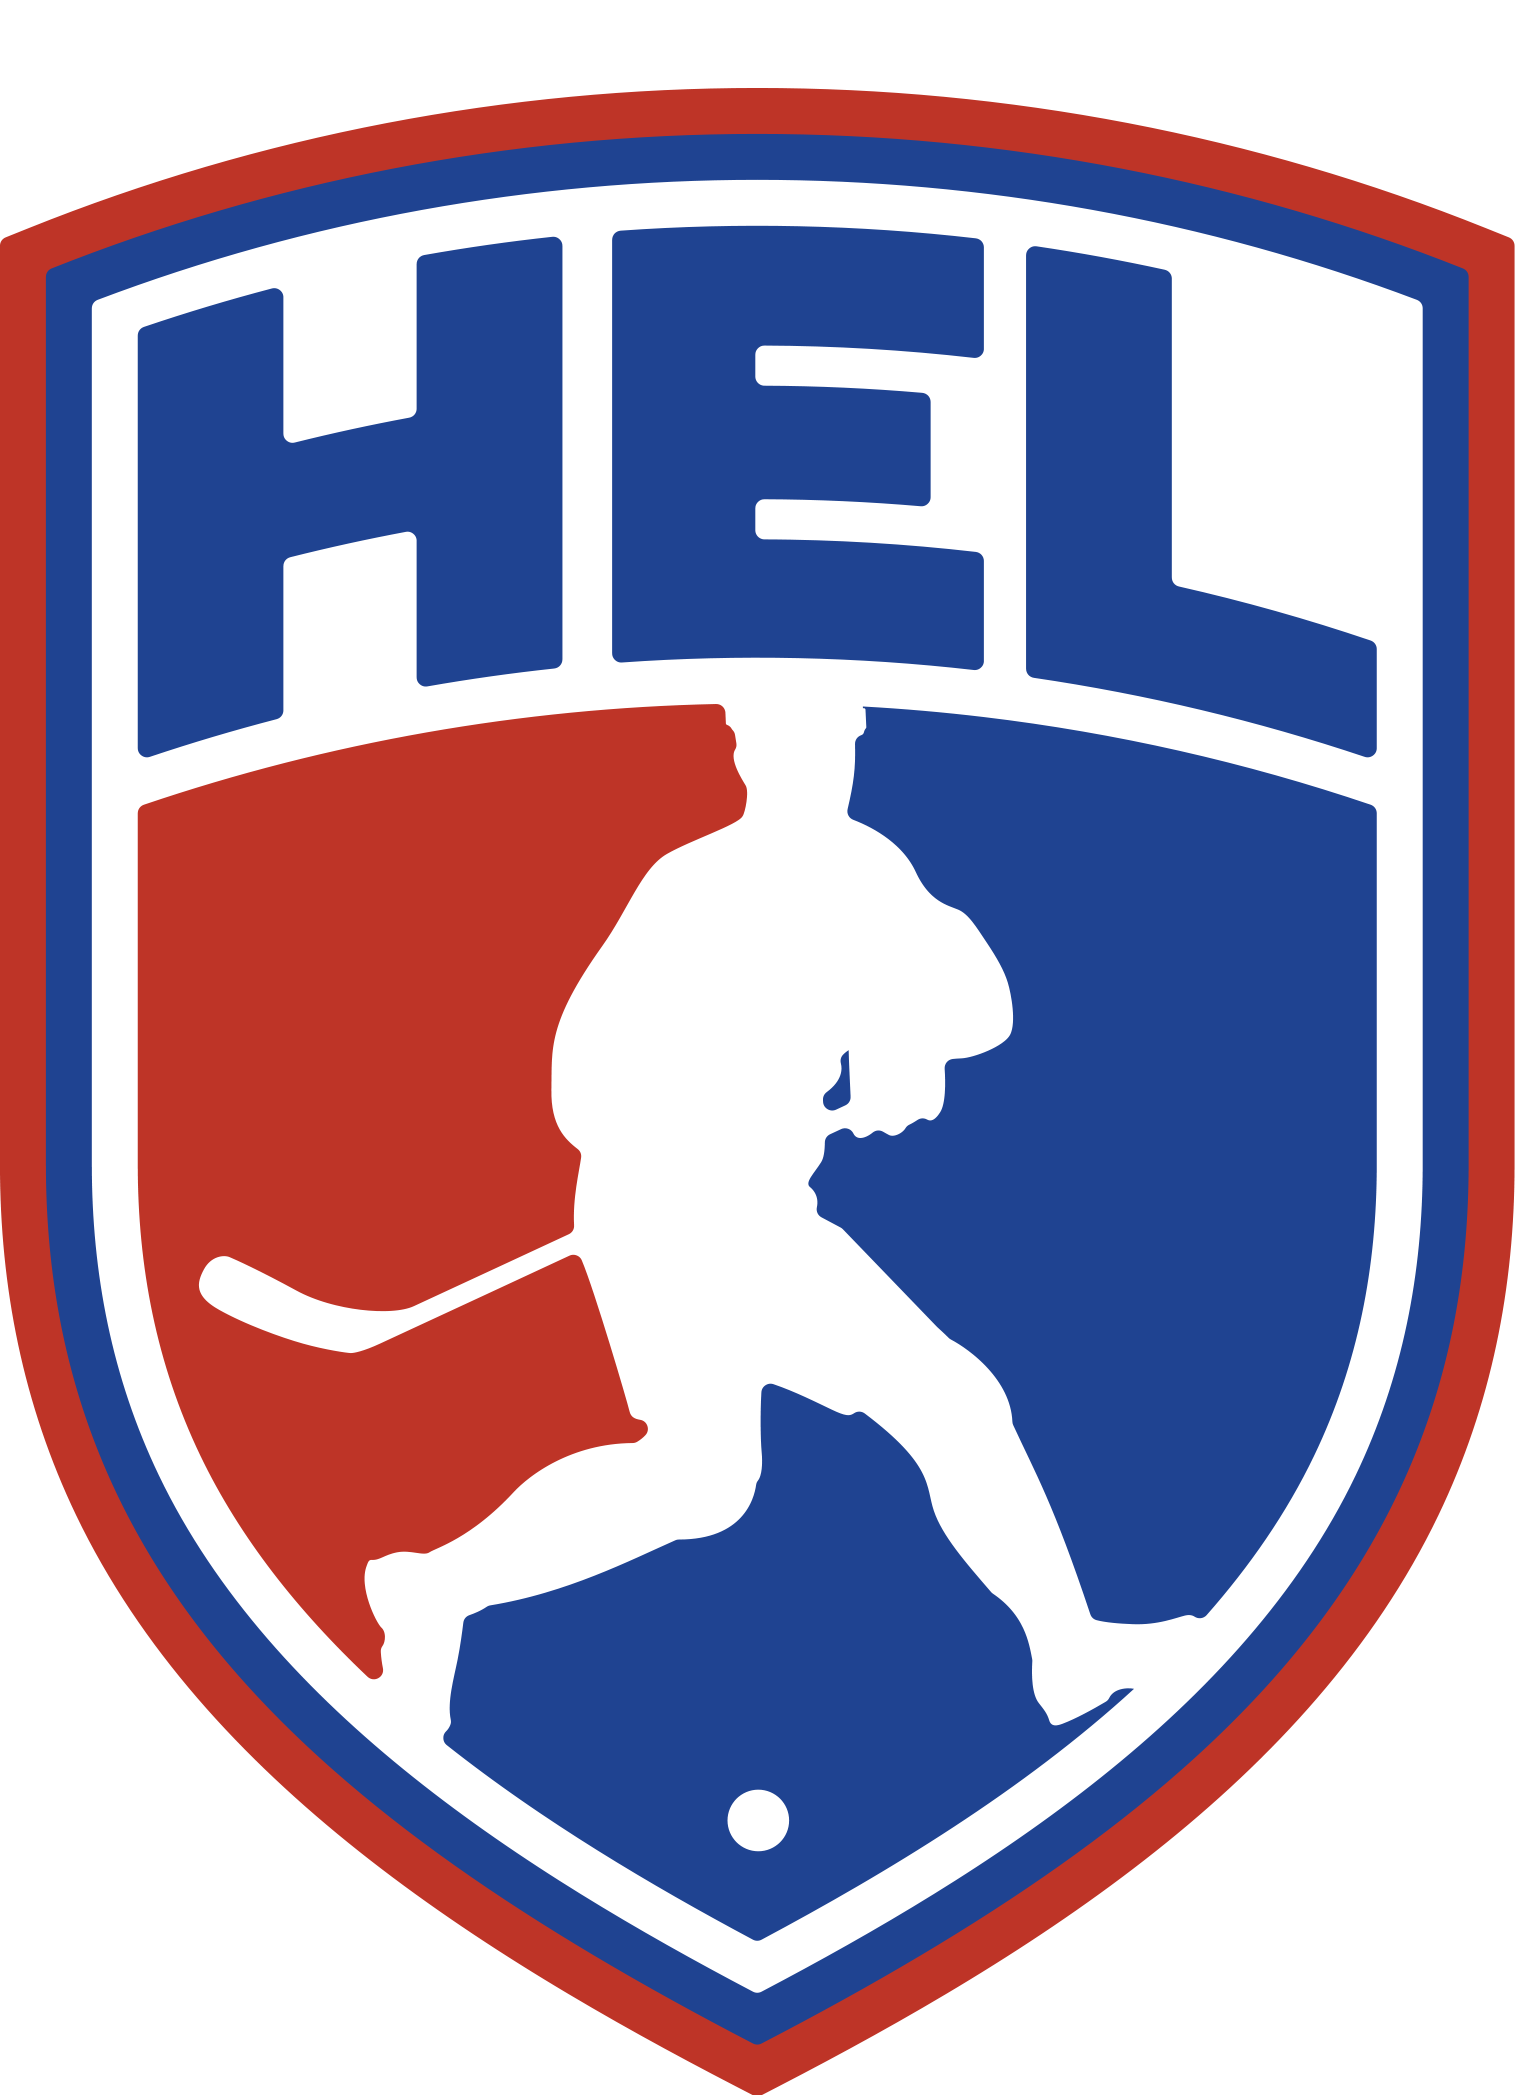 Hokejbalová extraliga